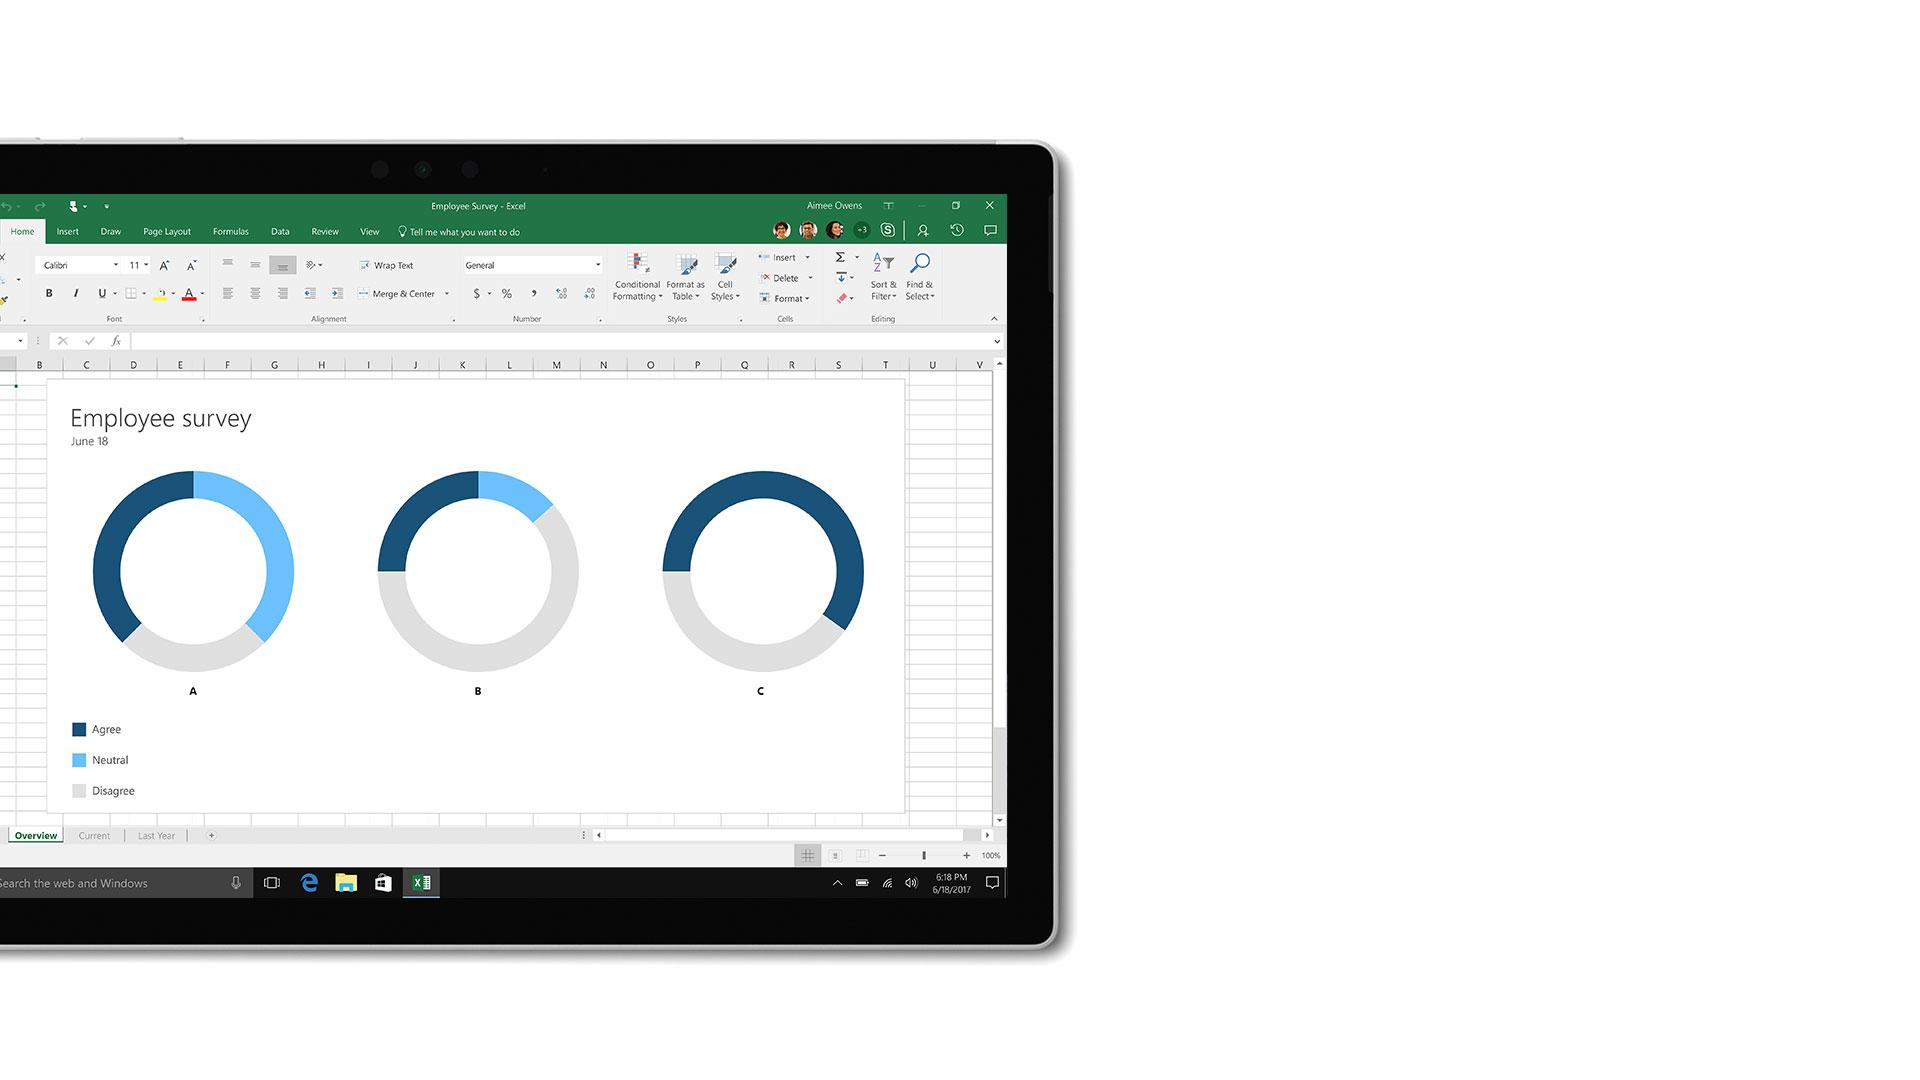 Microsoft Excel 使用者介面的影像